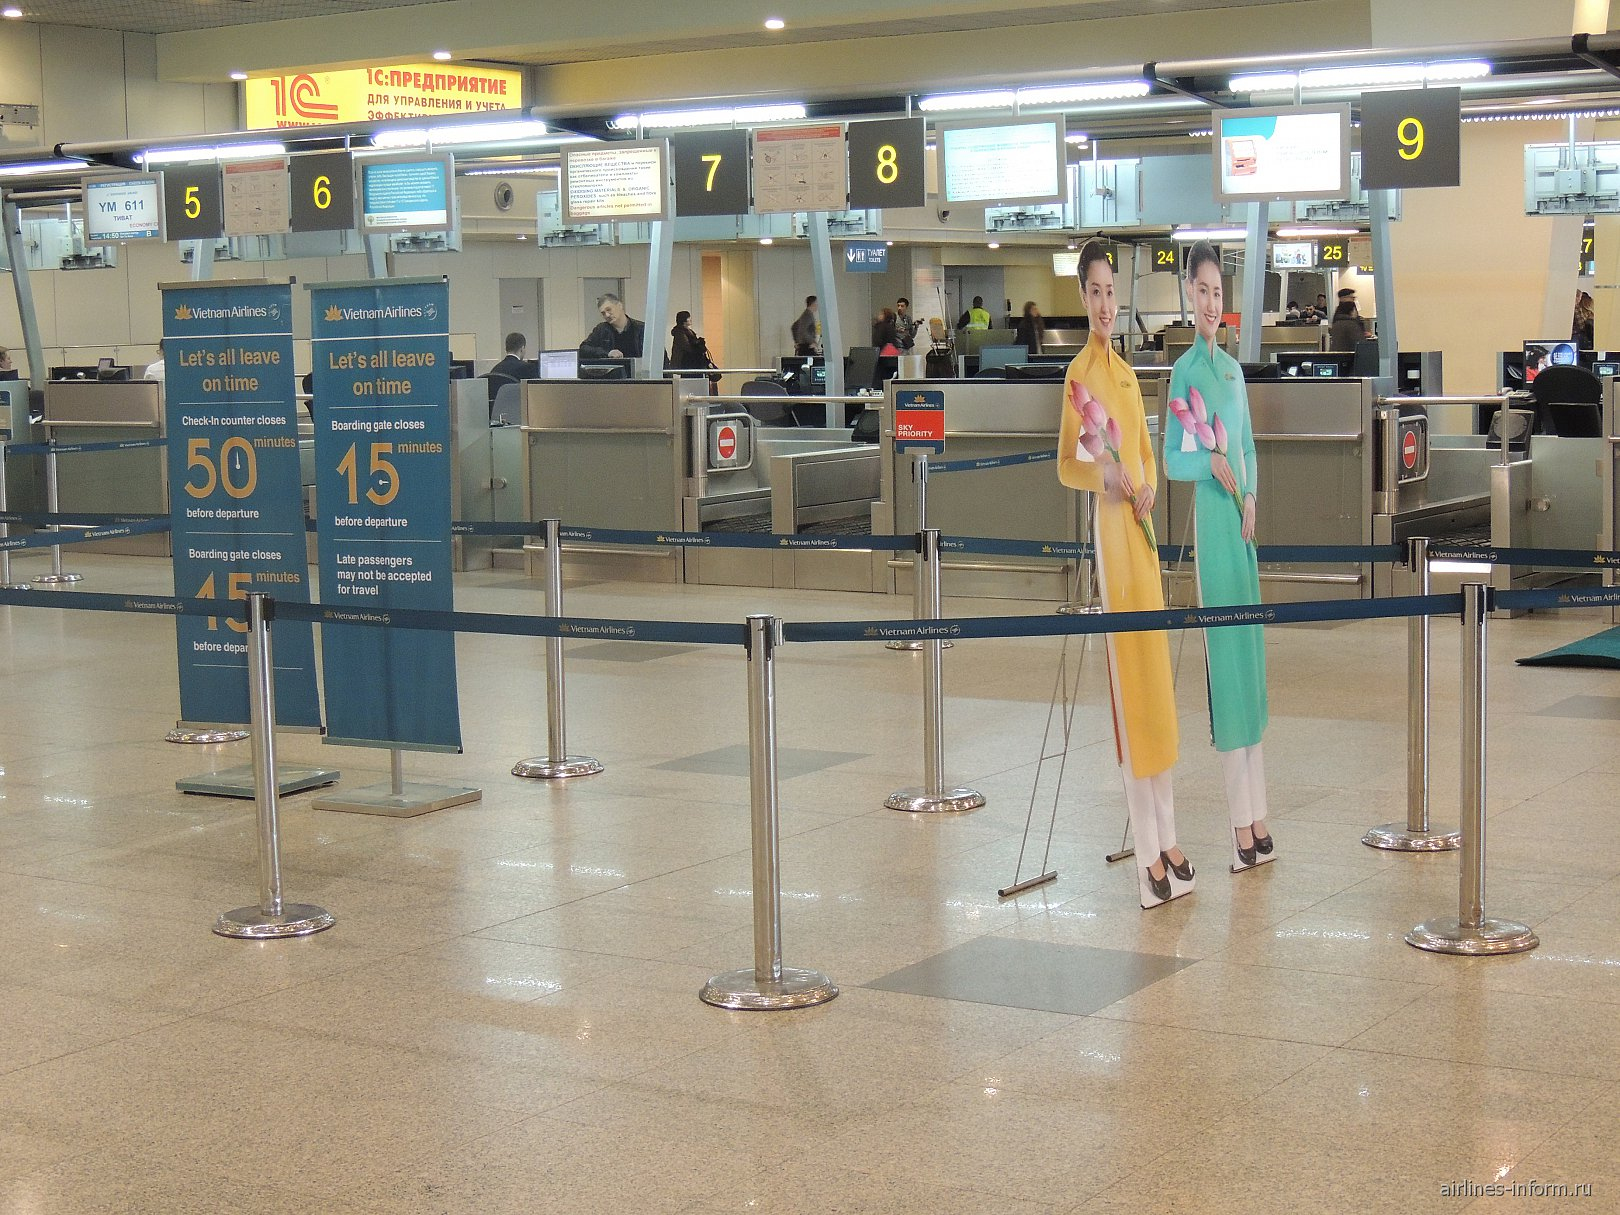 Регистрация на рейс Вьетнамских авиалиний в аэропорту Домодедово